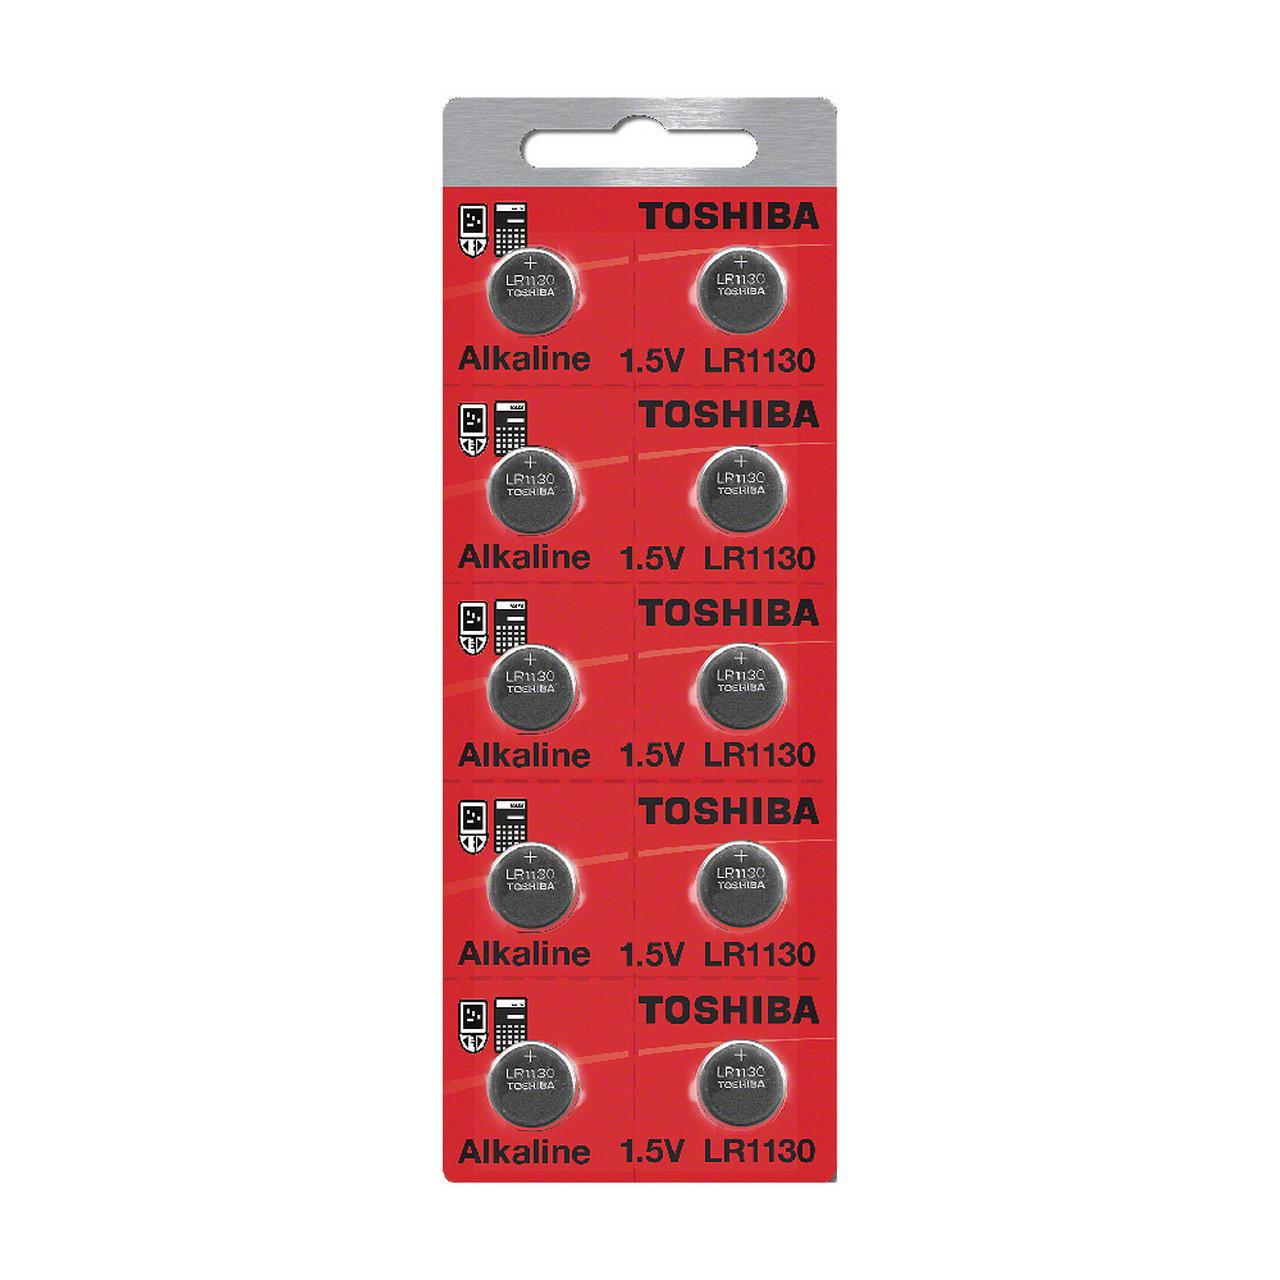 Toshiba 1130 189 Alkaline 1.5 Volt Batteries Wholesale 10...